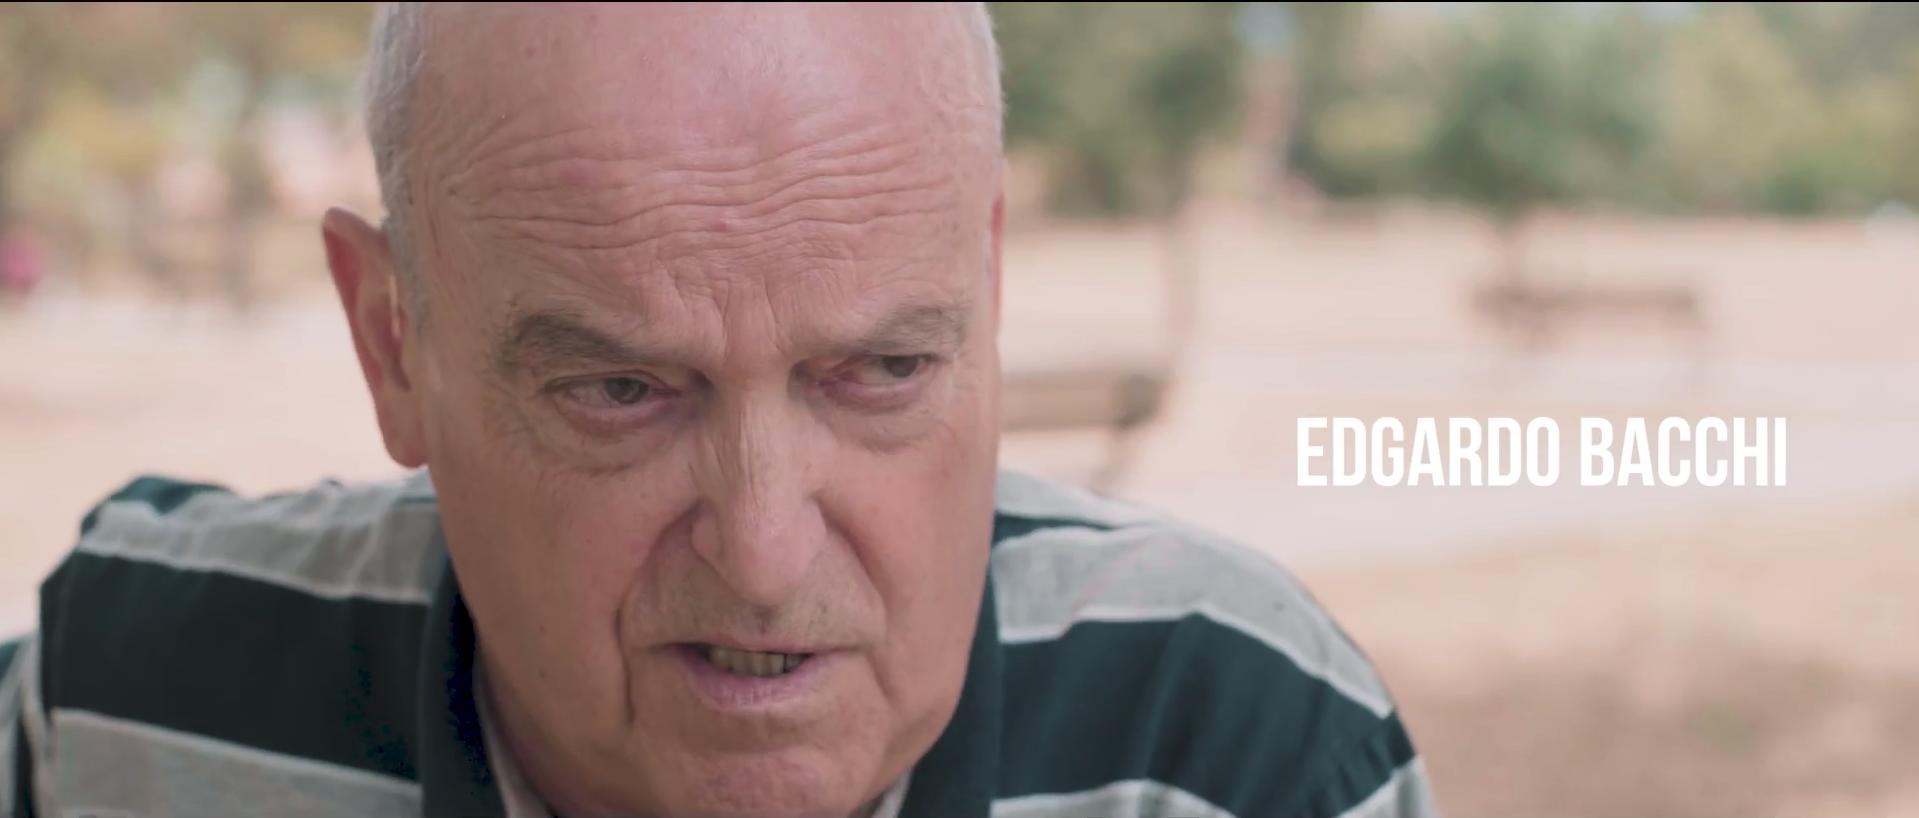 Edgardo Bacchi - Candidato Consigliere